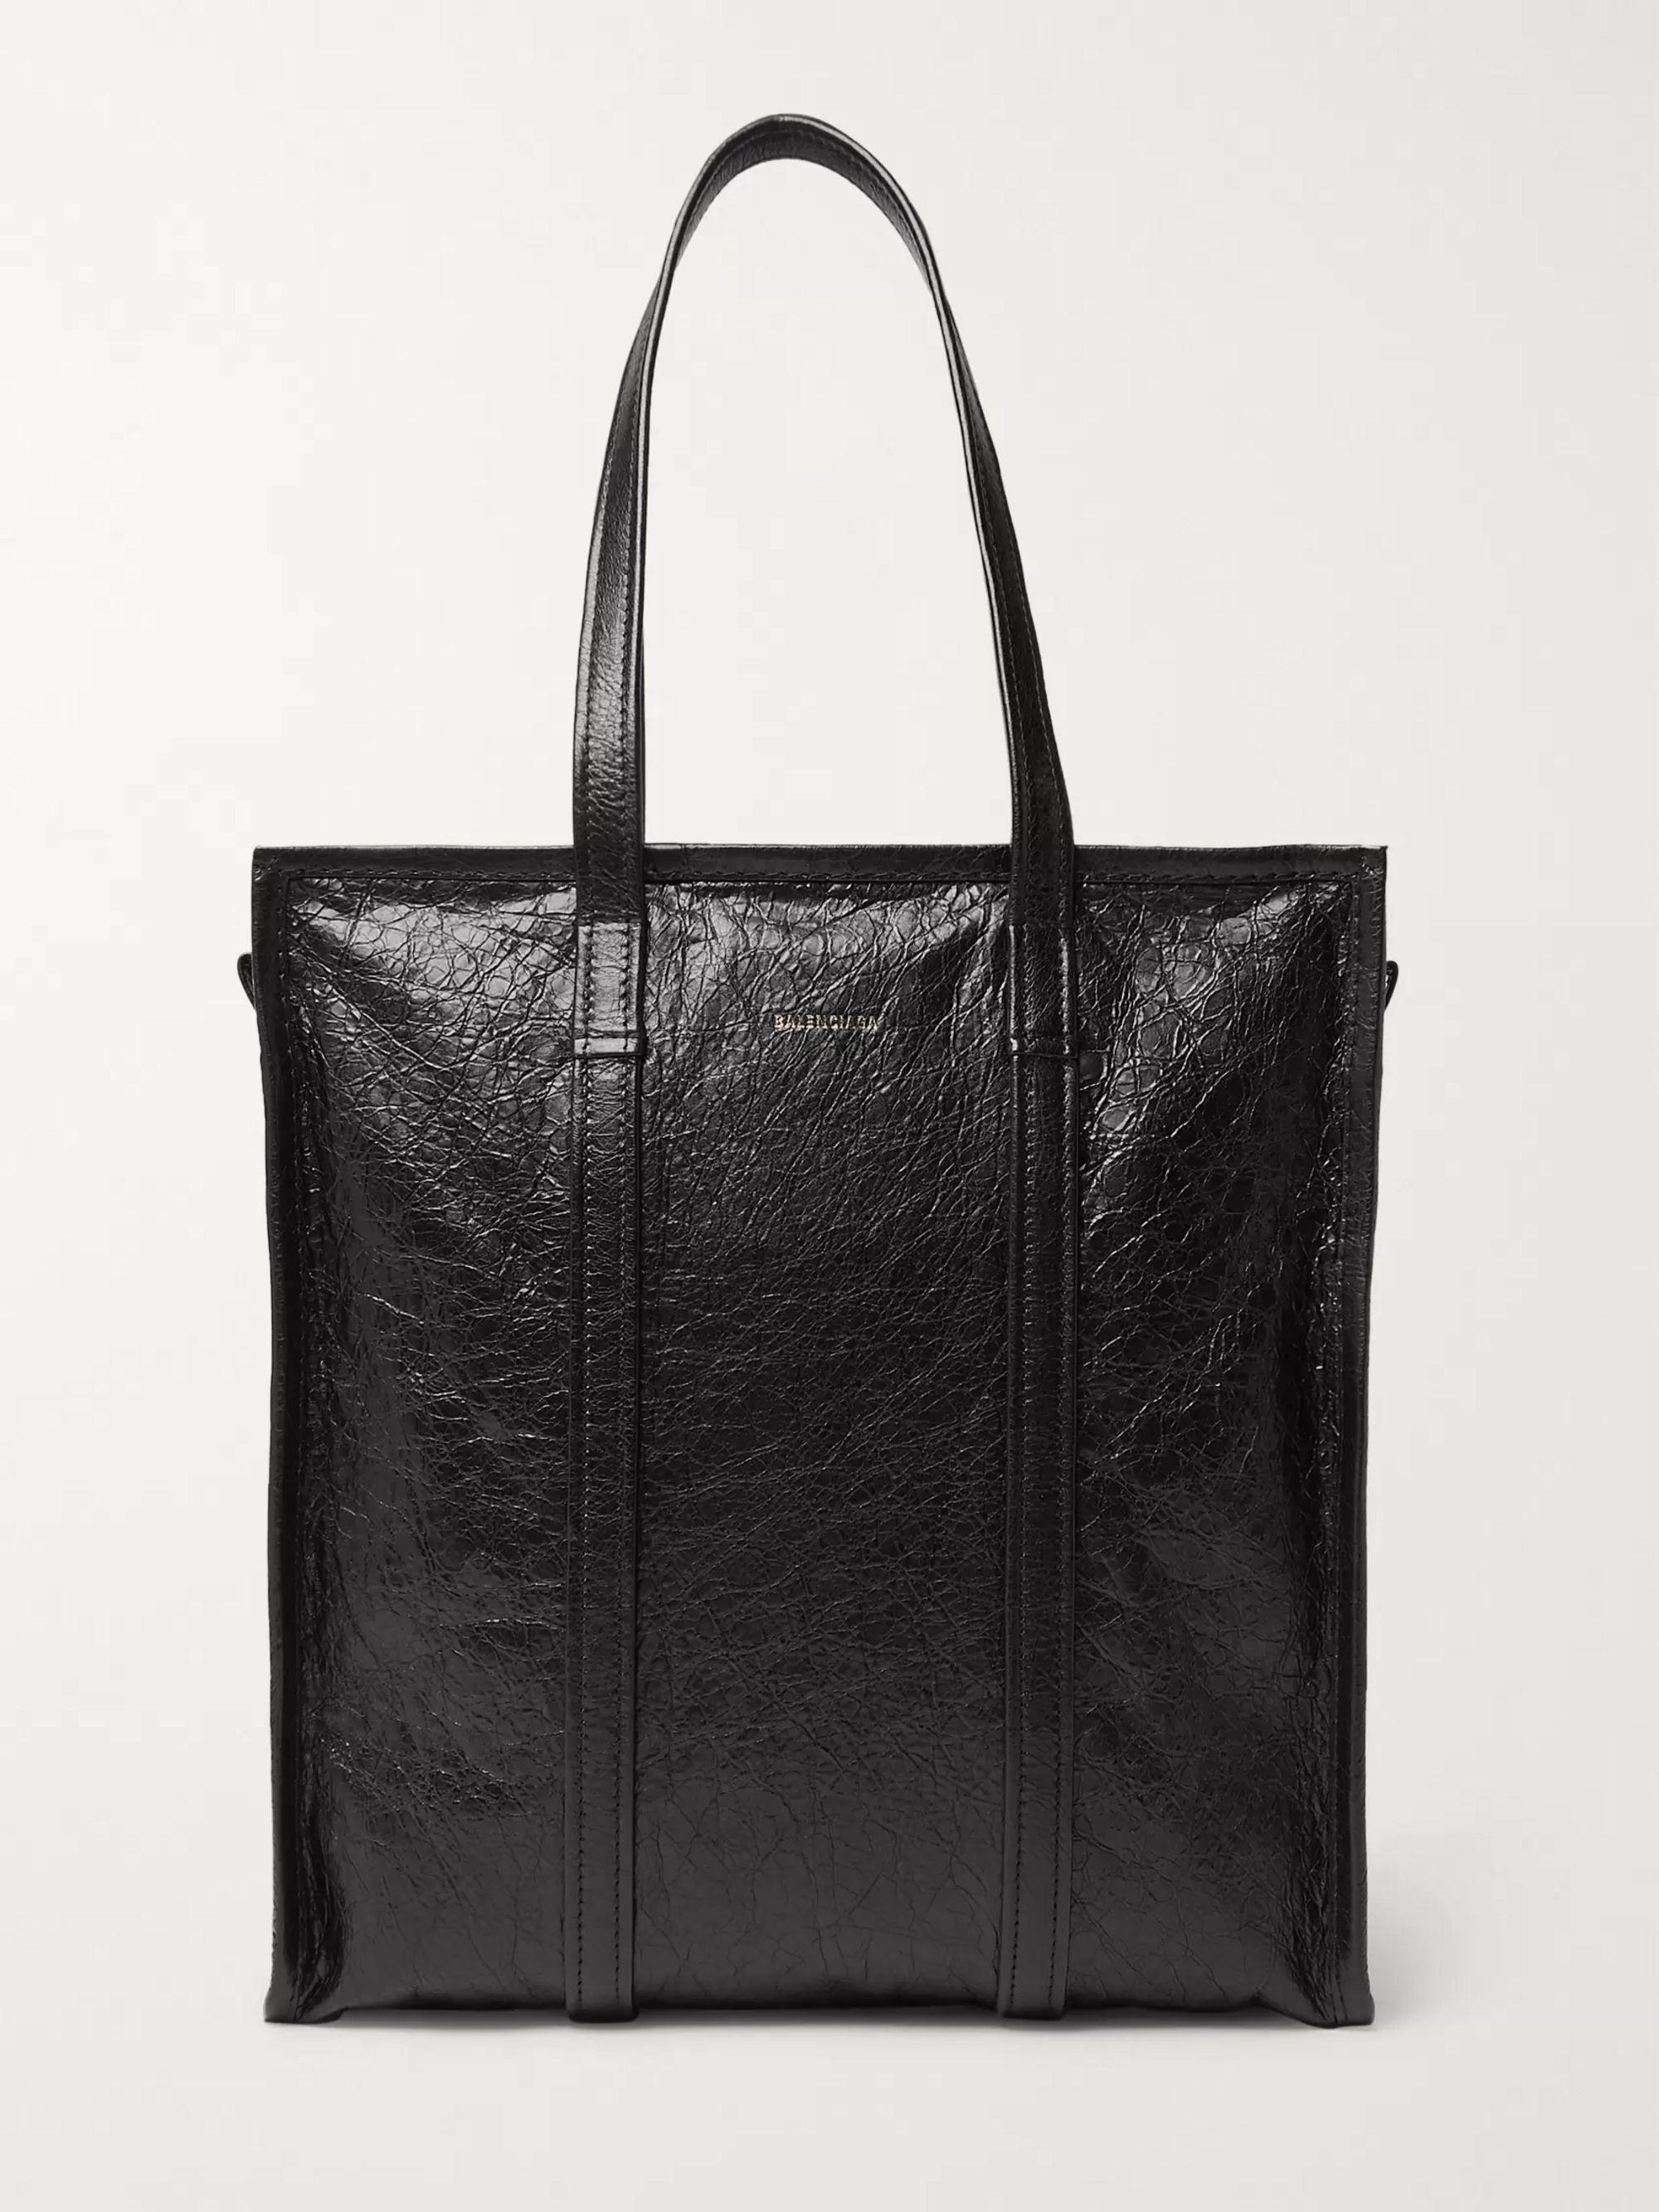 Black Creased-Leather Tote Bag